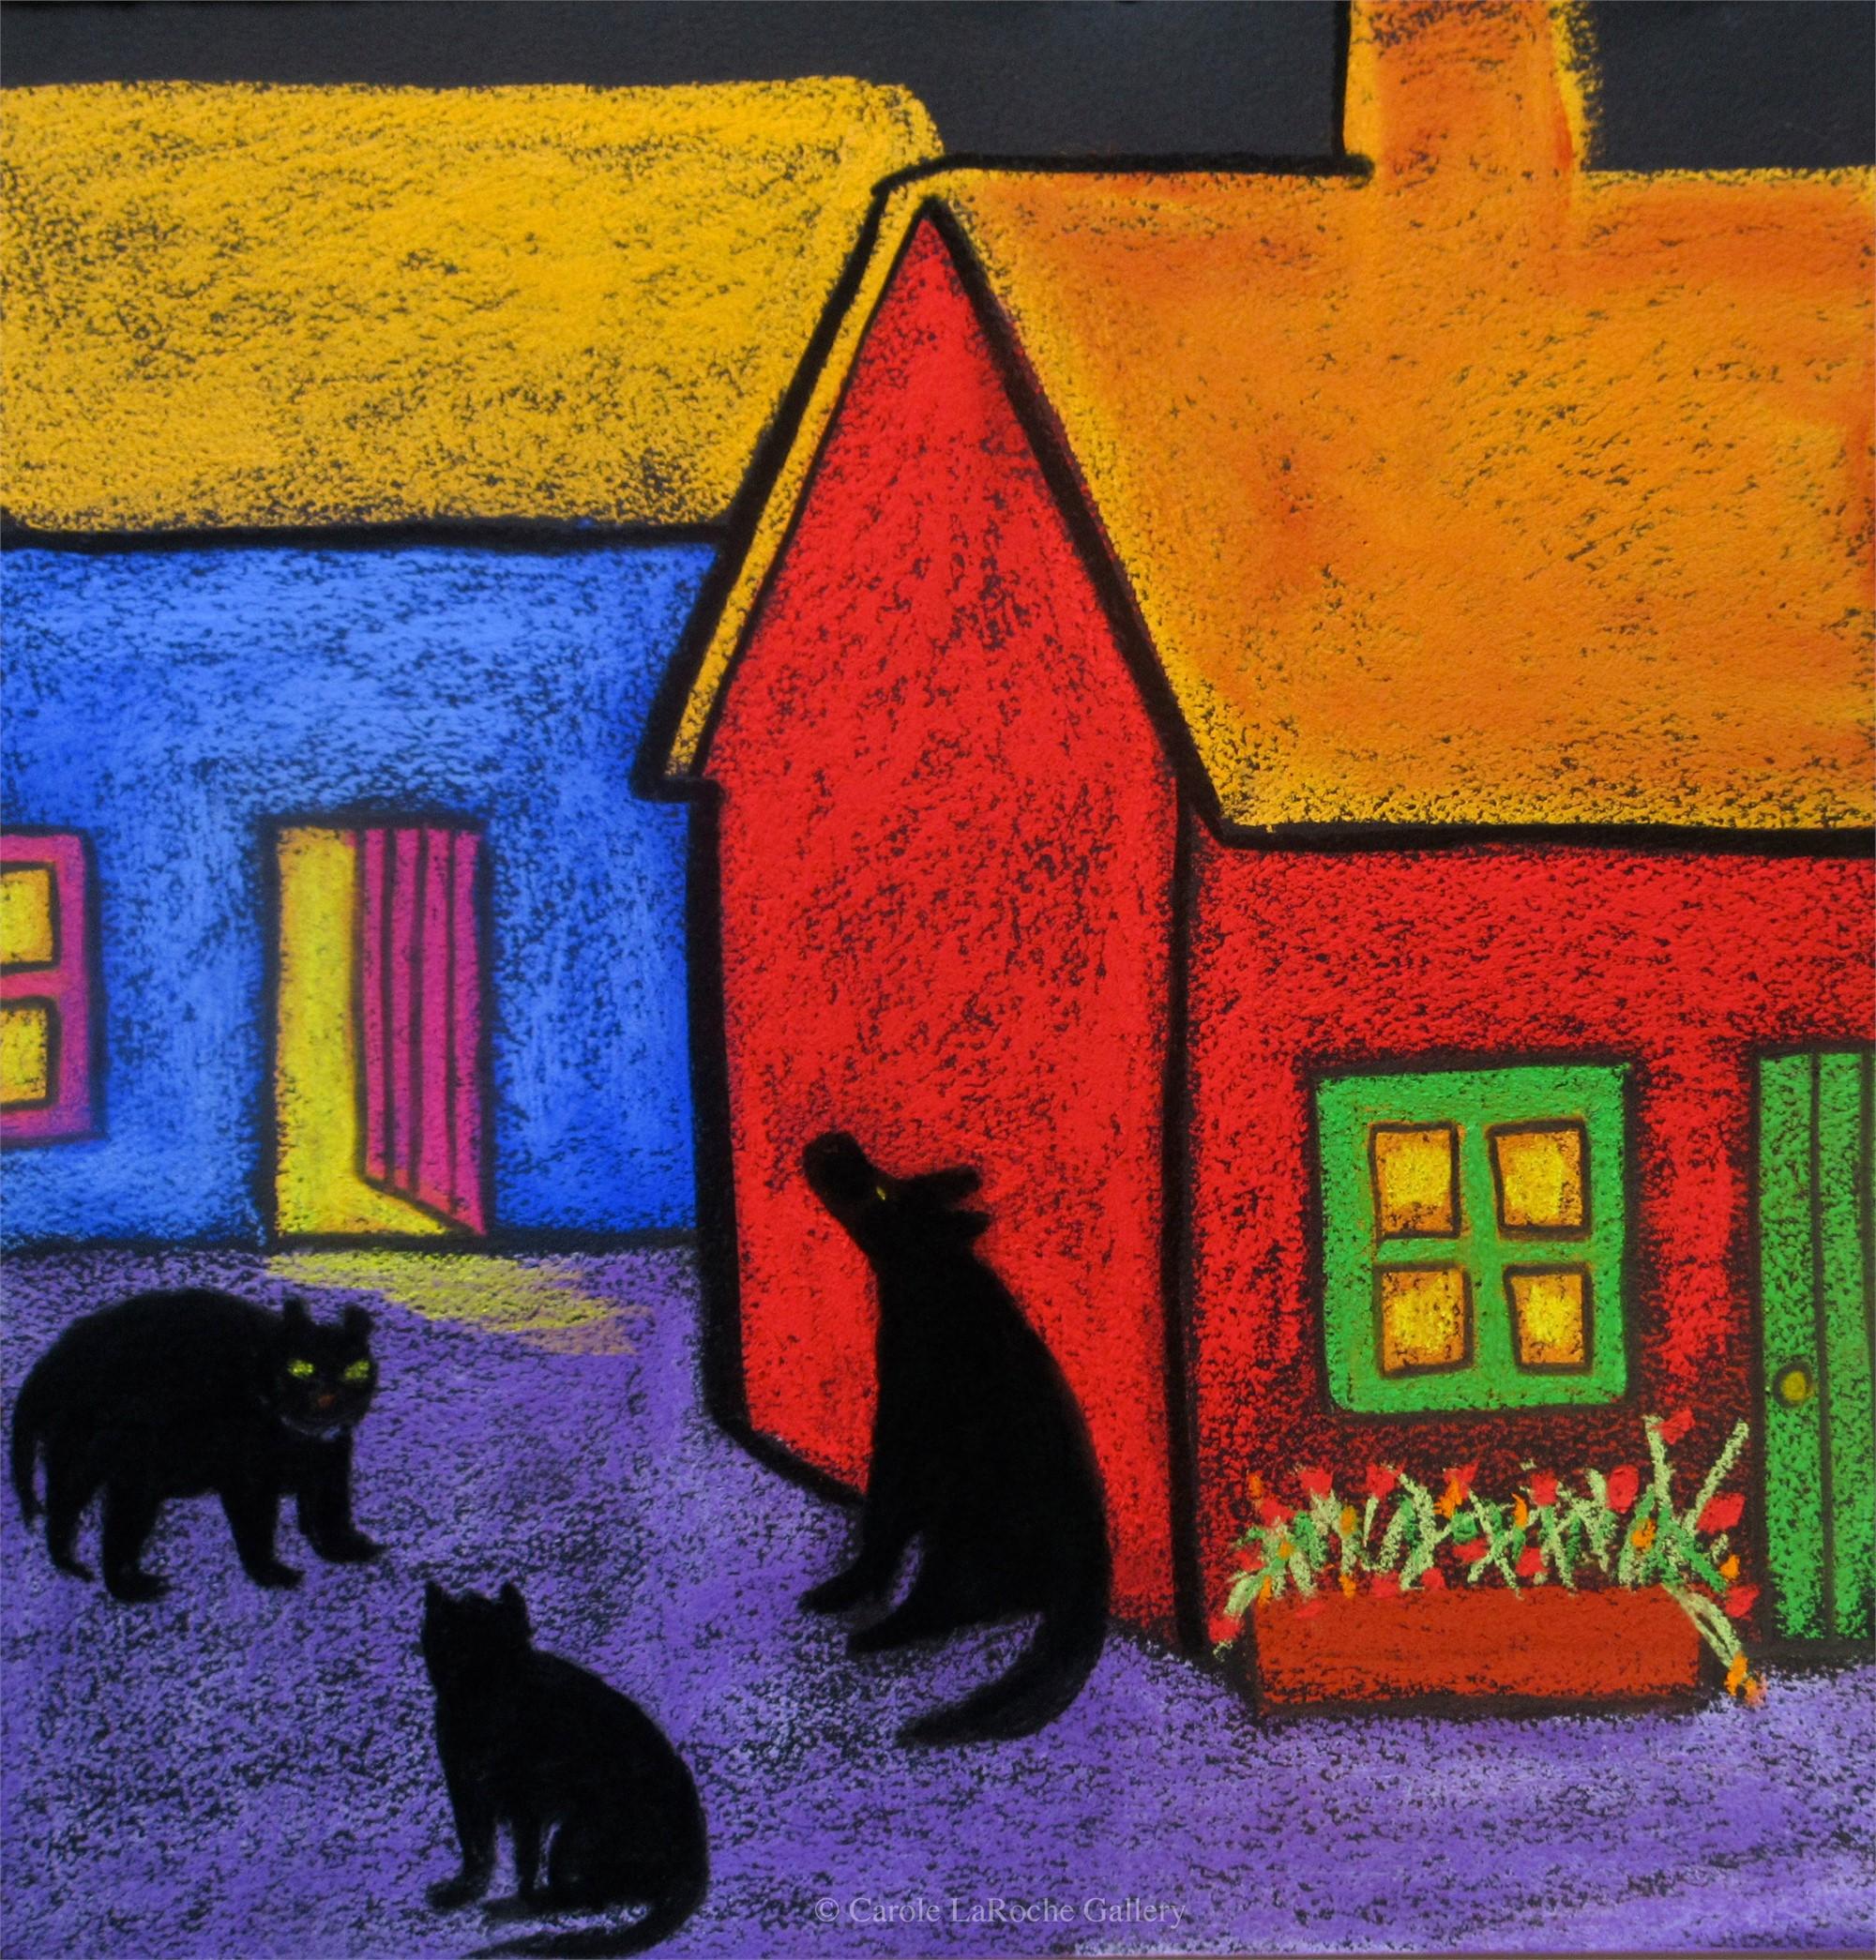 WELCOME HOME by Carole LaRoche